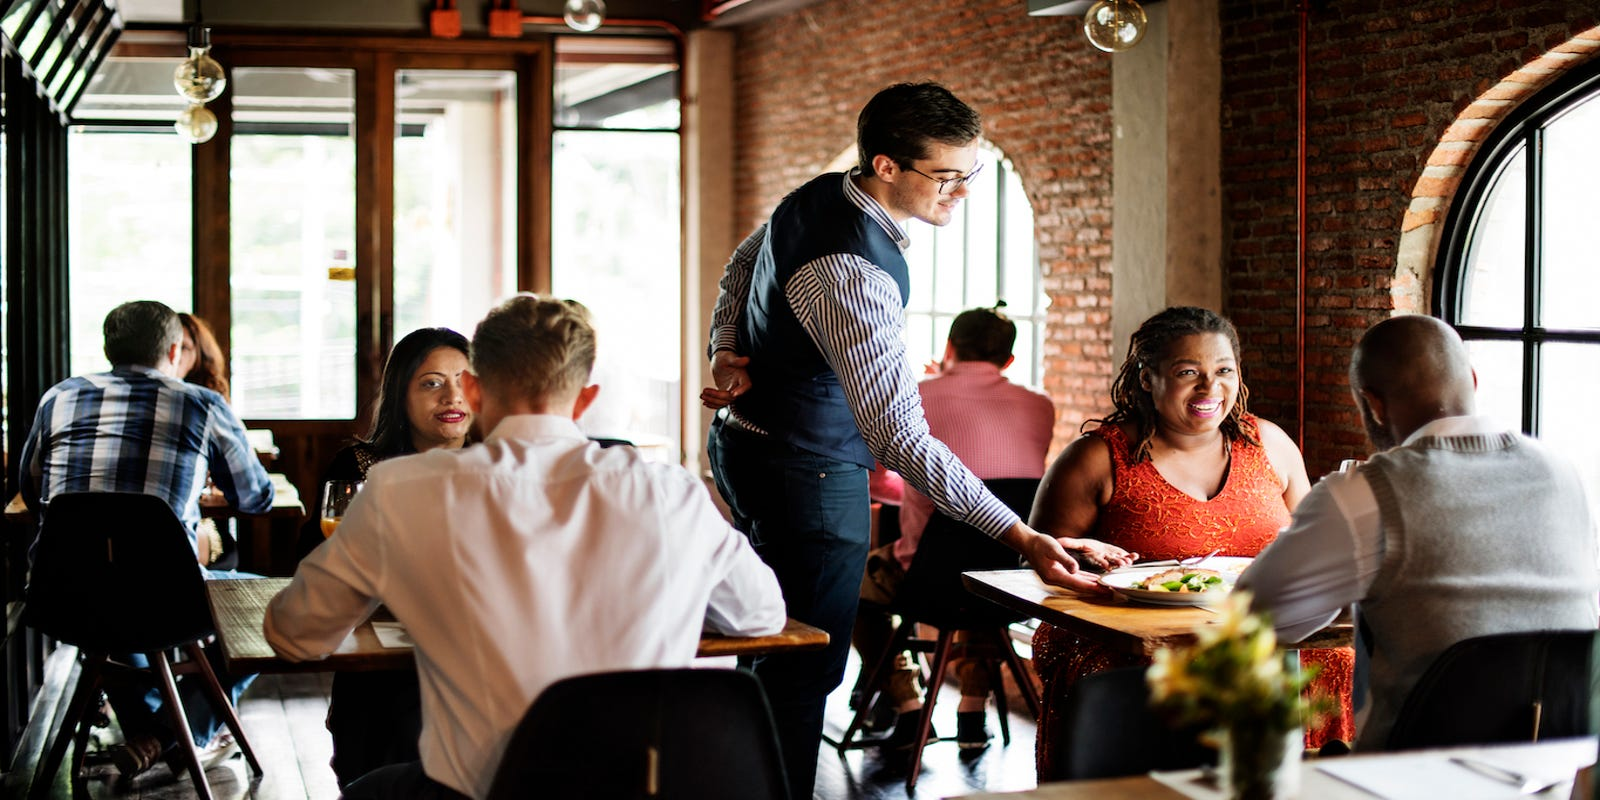 Profitable restaurants: Highest grossing eateries in America